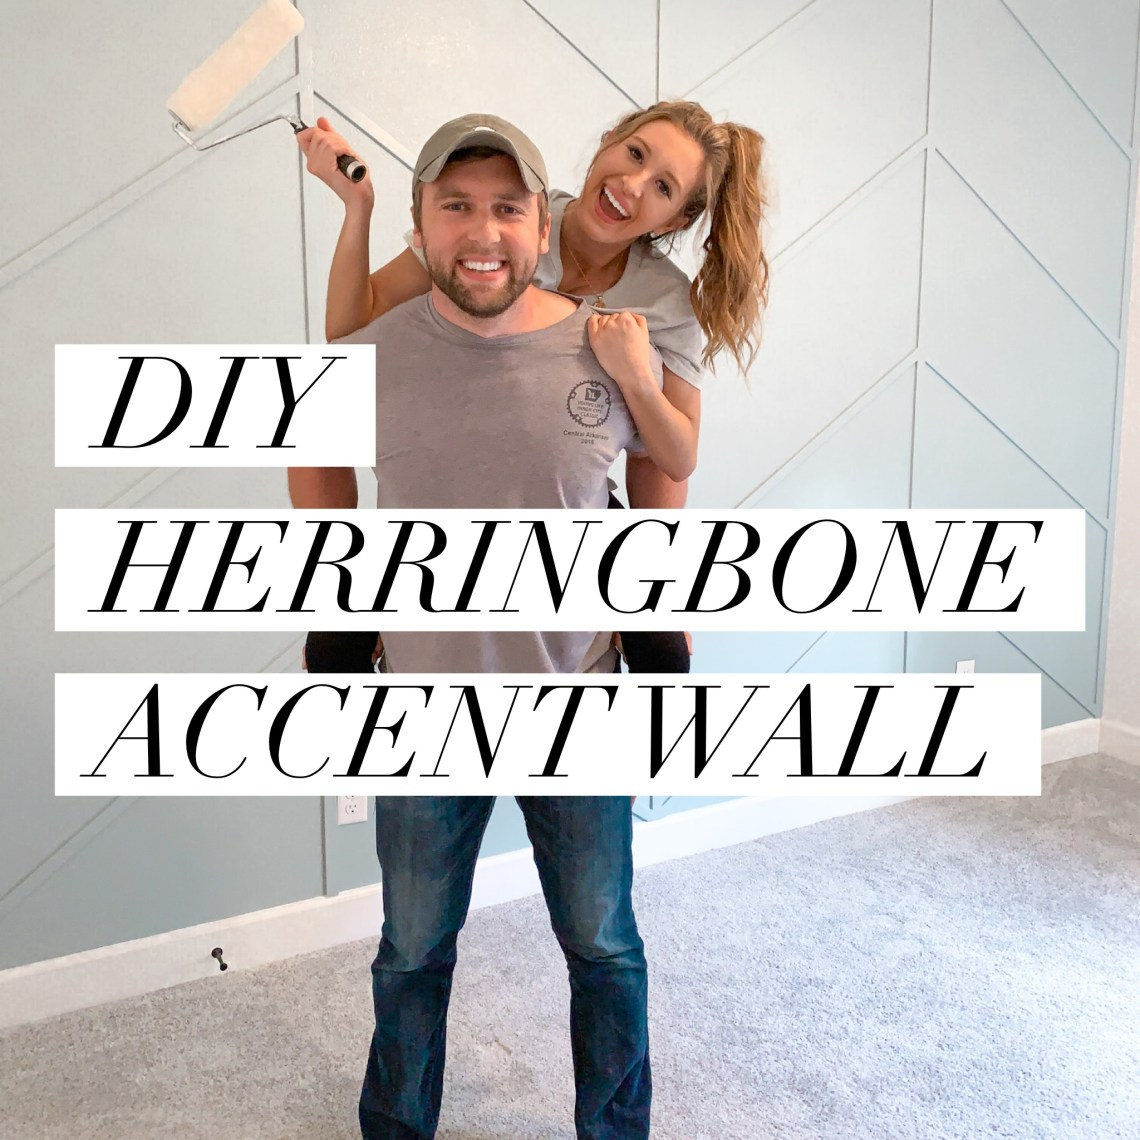 IMG 8468 Facetune 03 05 2020 09 20 38 - DIY Herringbone Wall